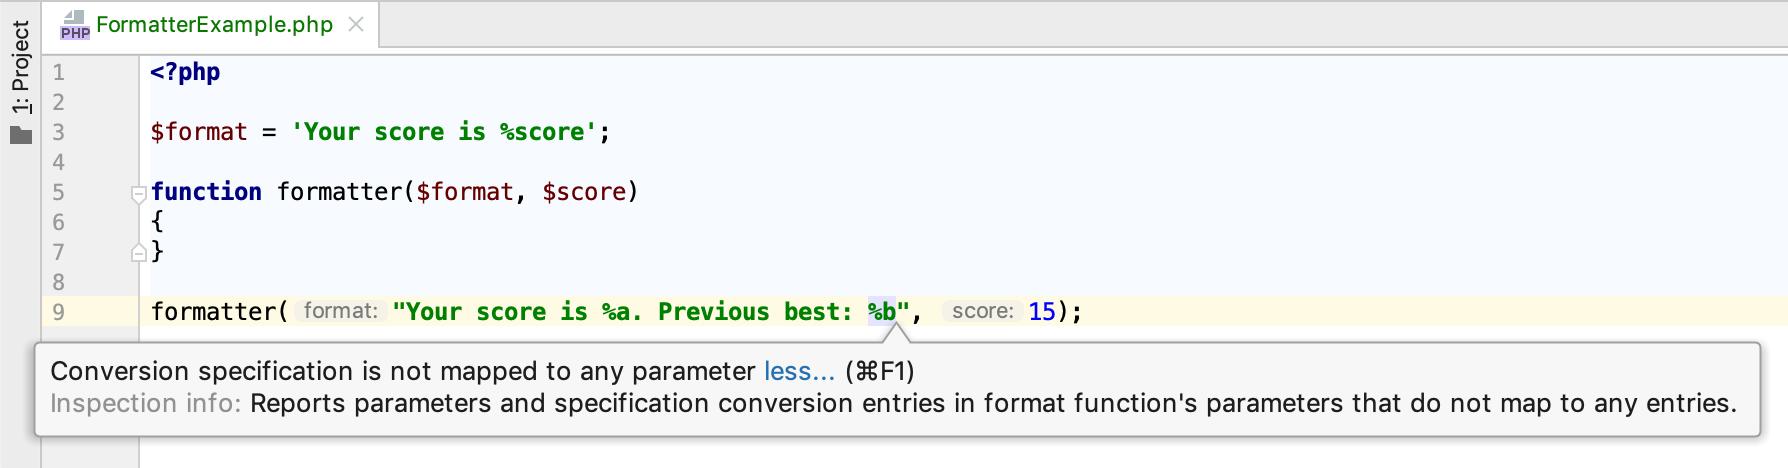 add_custom_format_function_example